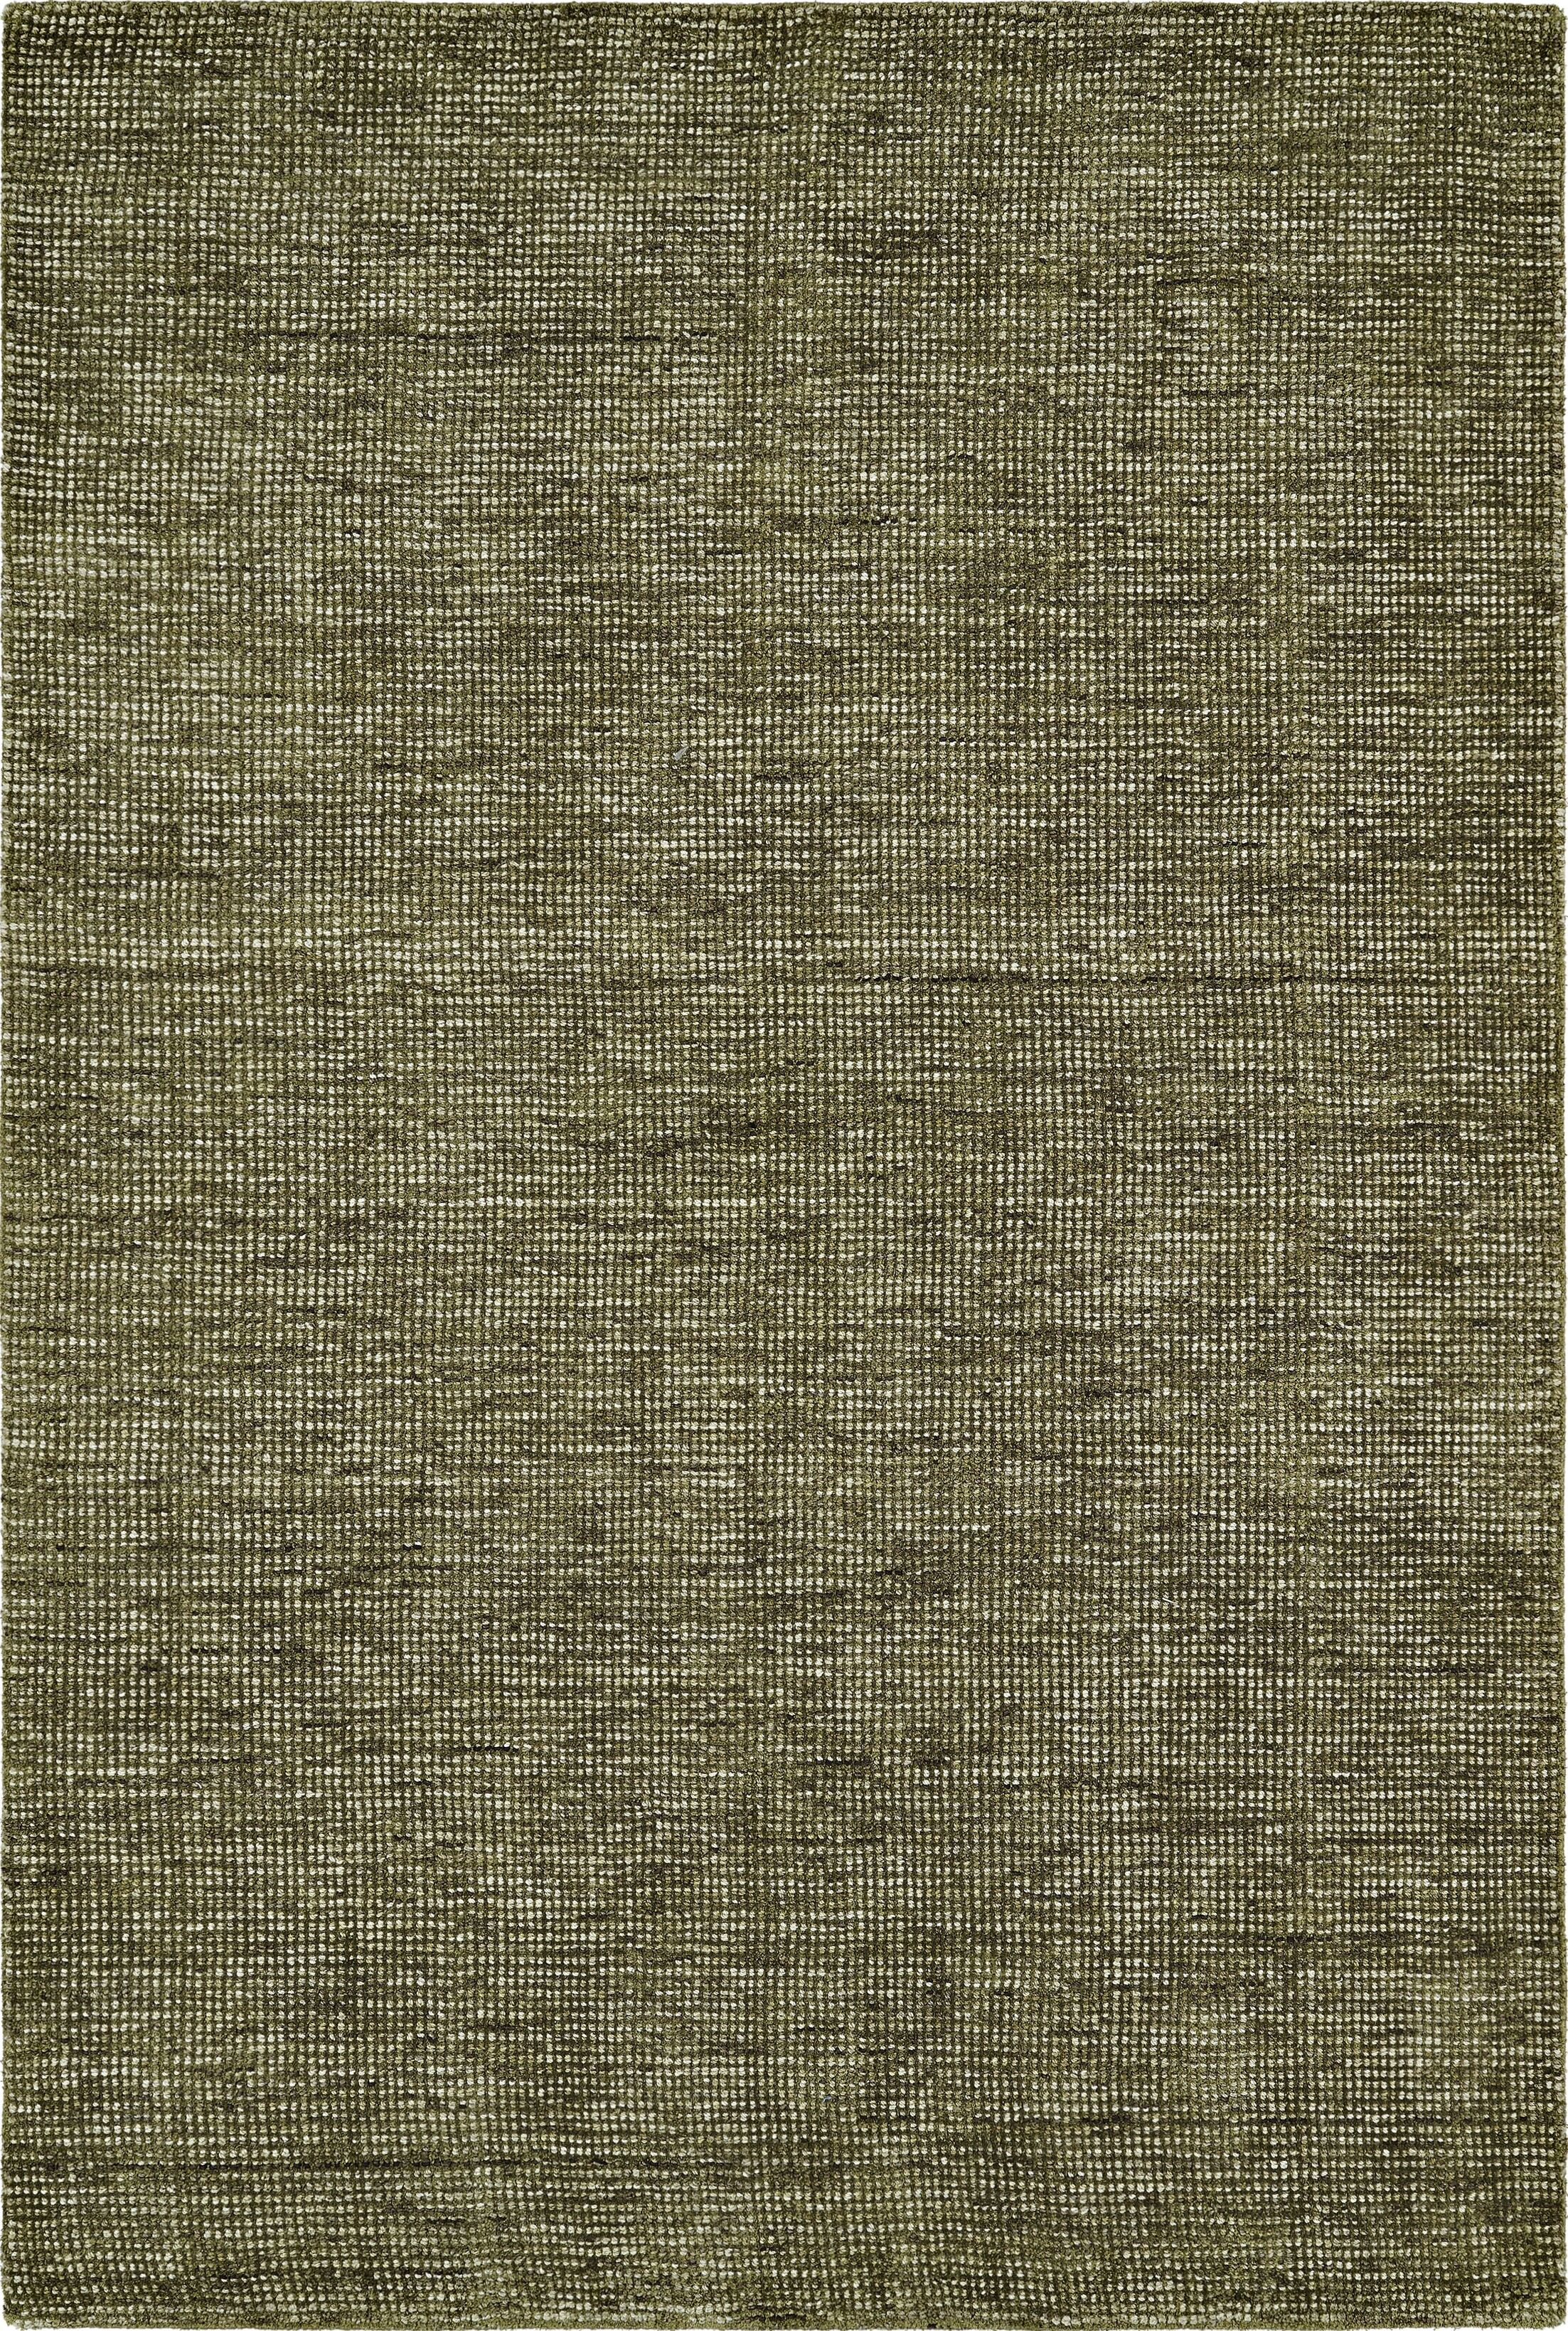 Toro Hand-Loomed Fern Area Rug Rug Size: Rectangle 3'6